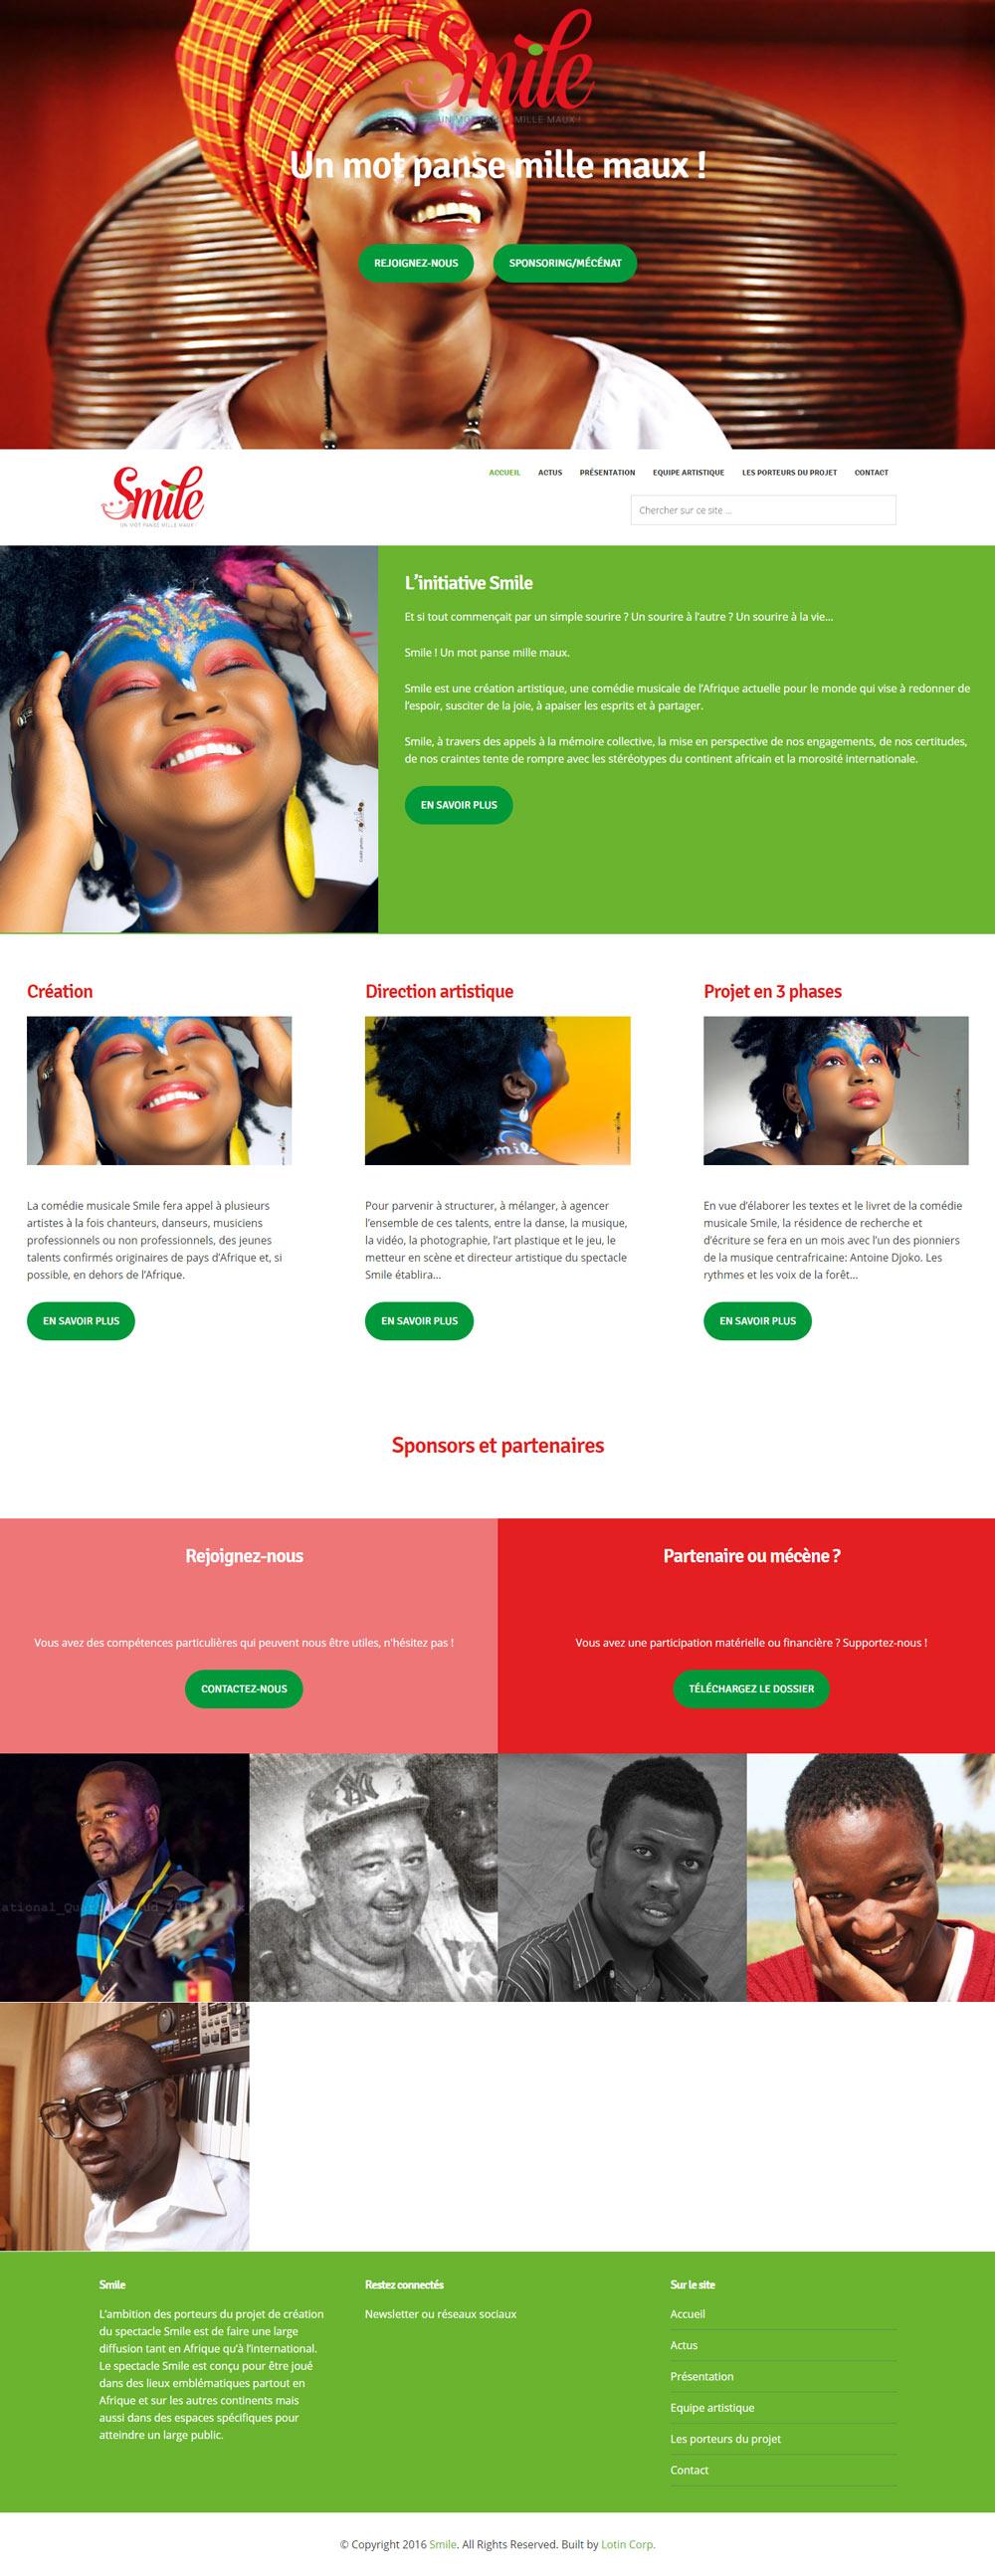 smile-homepage